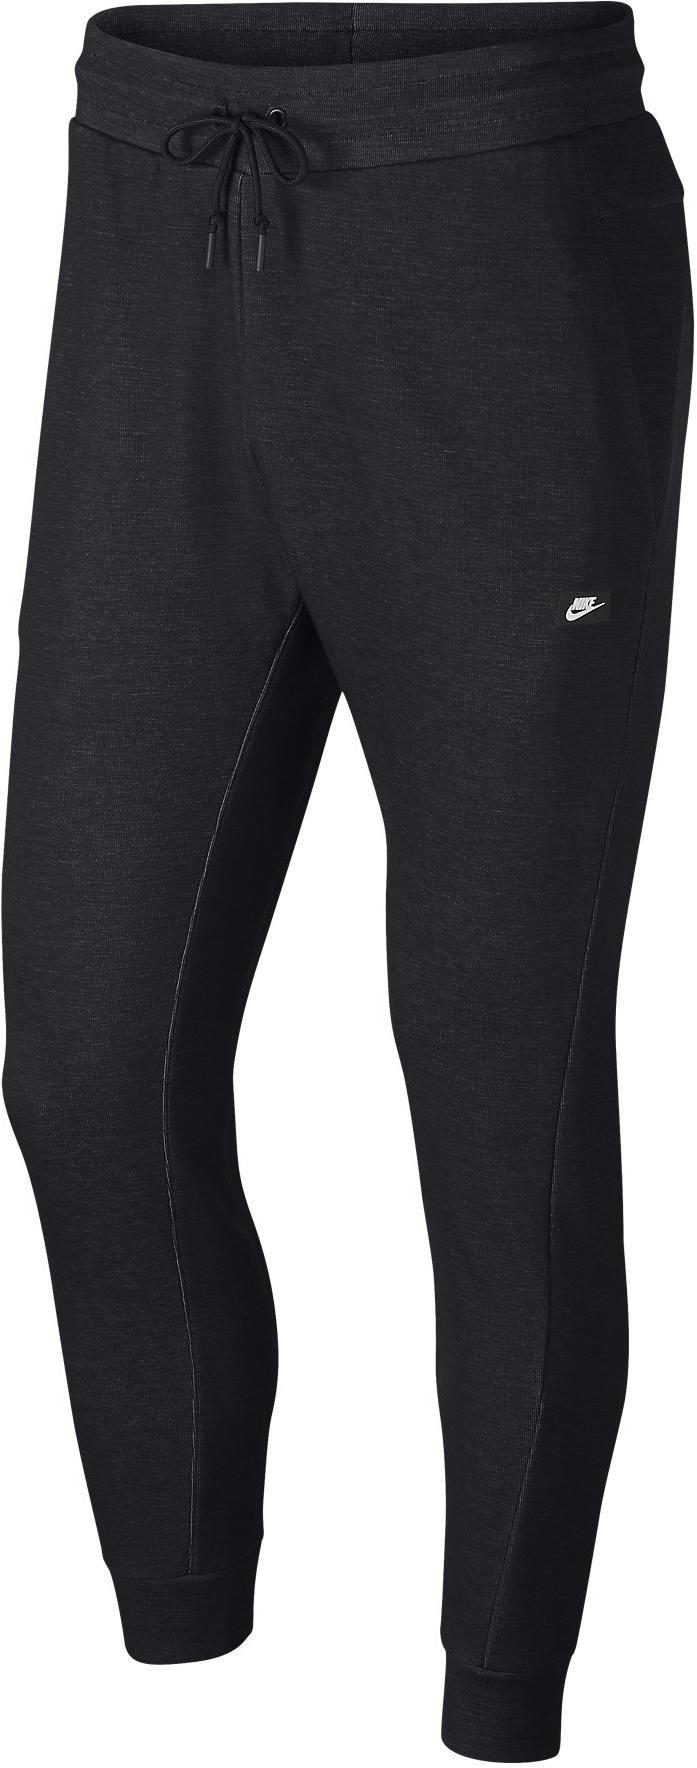 Nohavice Nike M NSW OPTIC JGGR